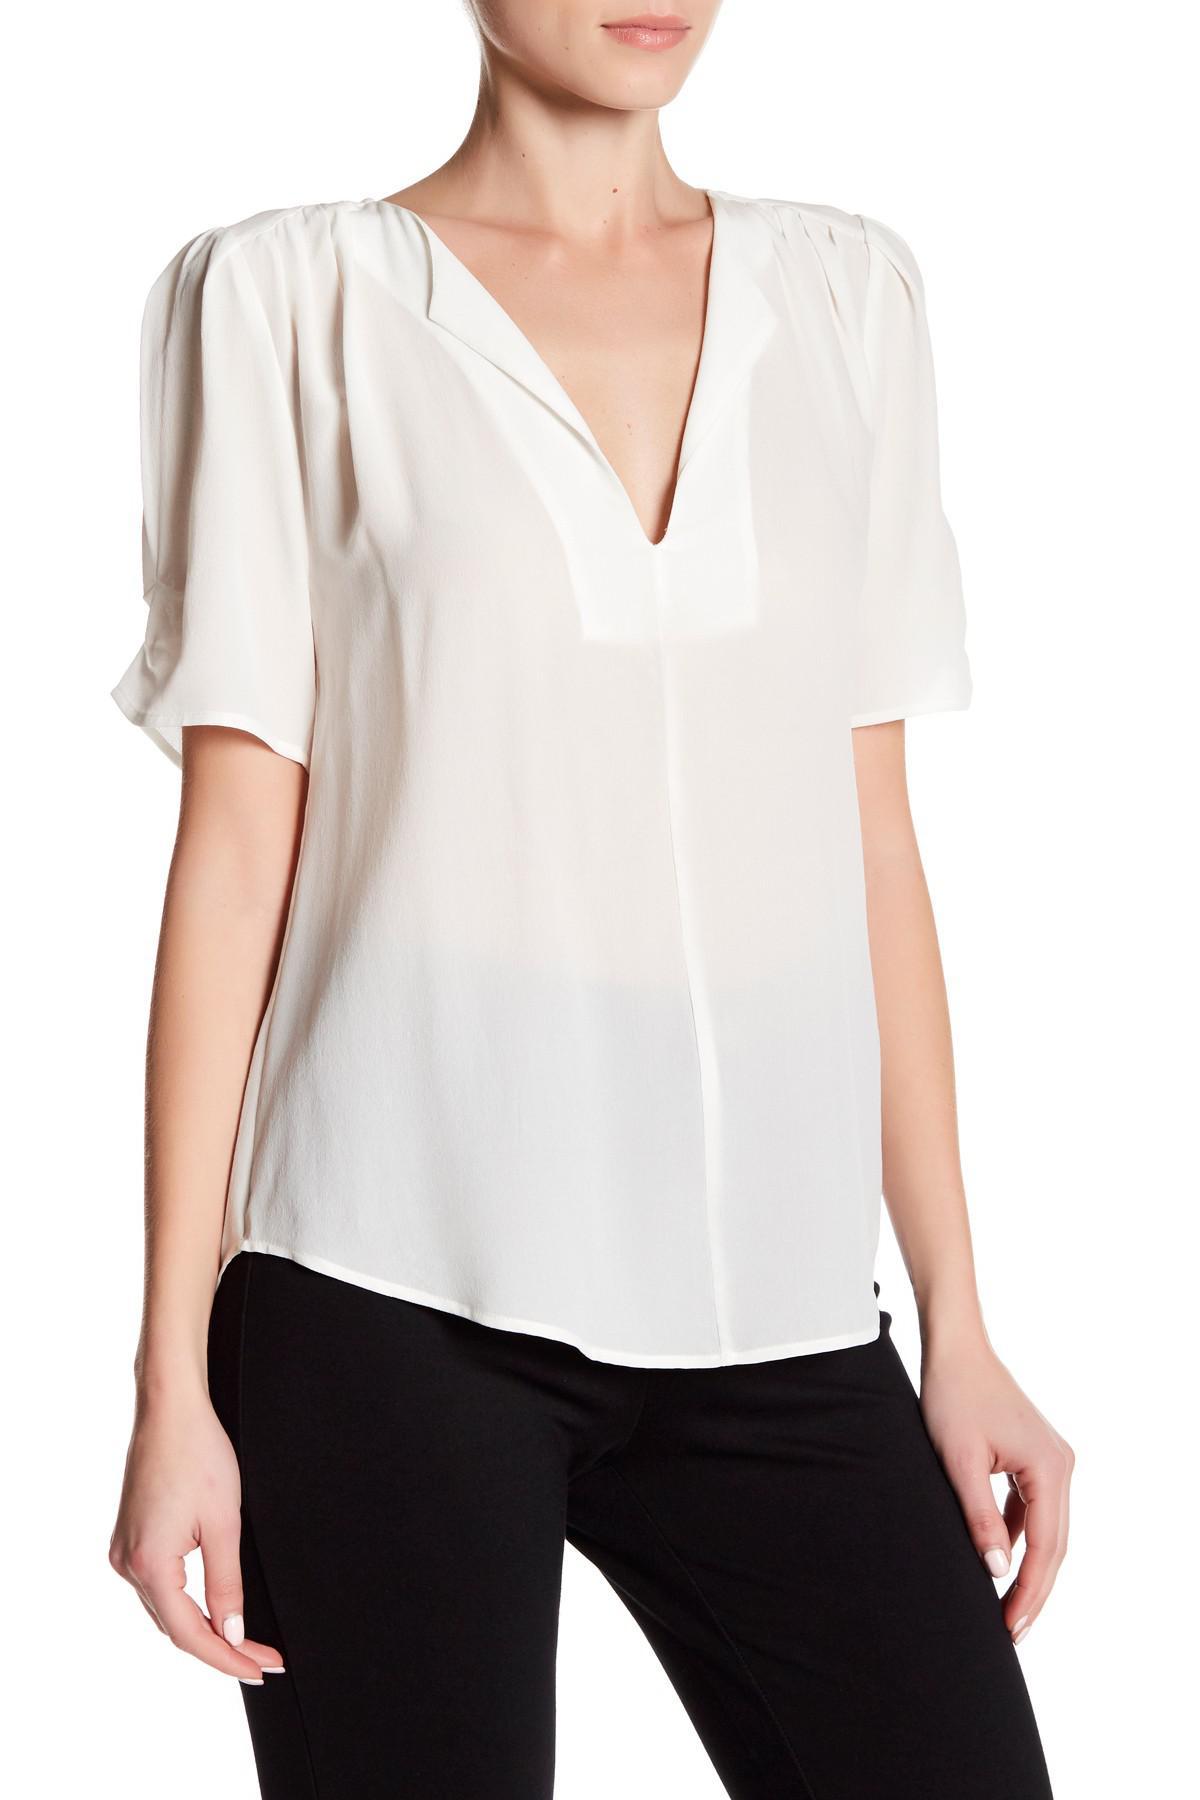 512a25ac22e57 Lyst - Joie Amone Pleat Silk Blouse in White